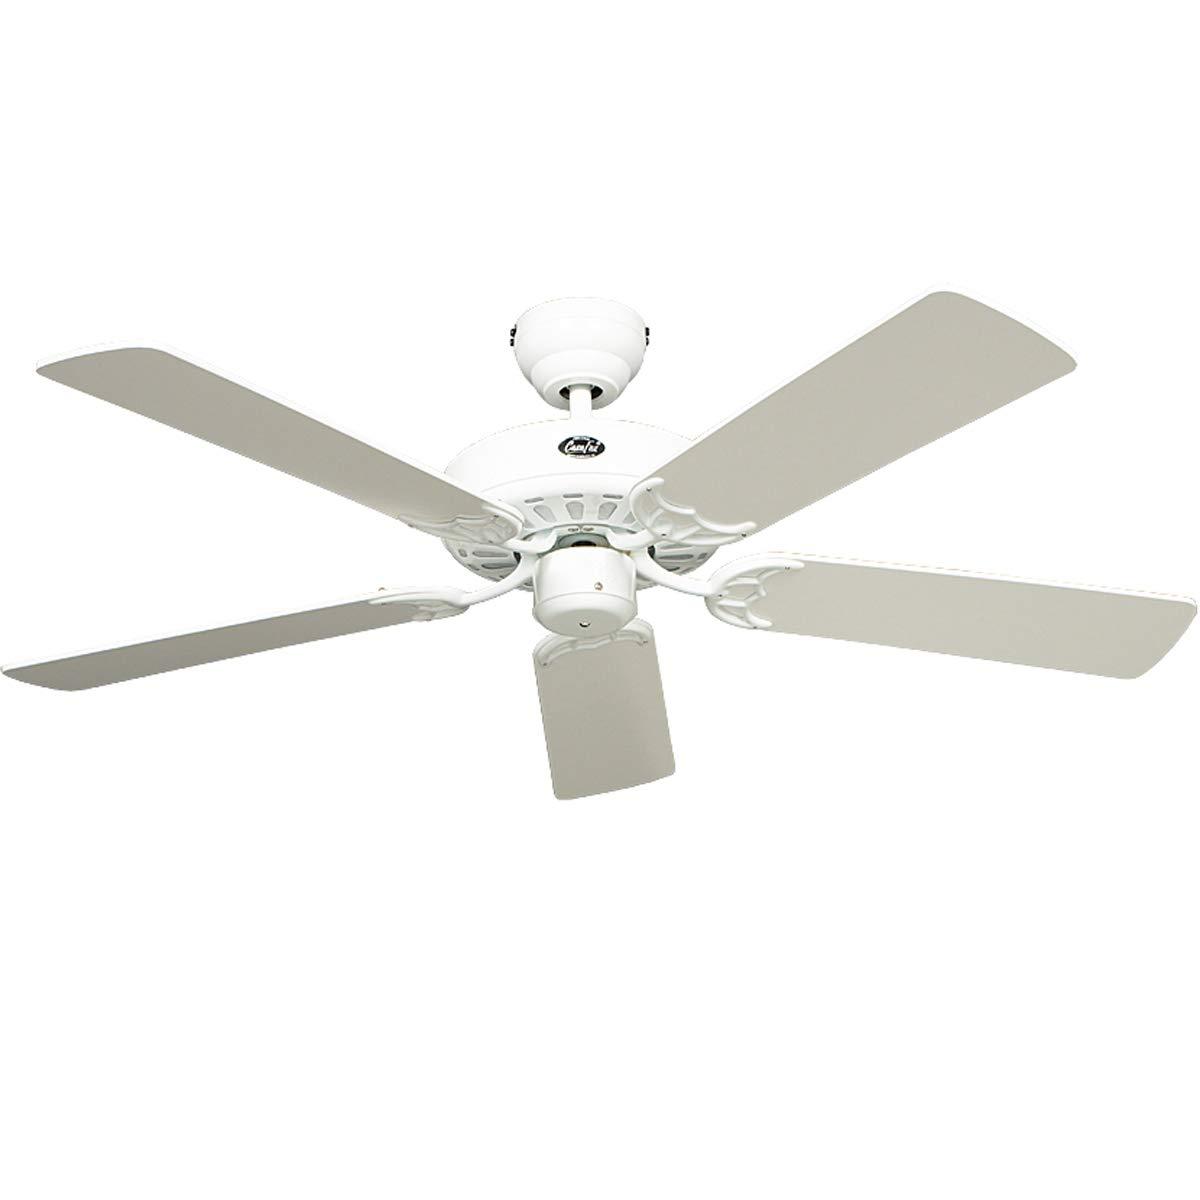 CasaFan Royal 103 Wir Haushalt Blade Fan 48 W Weiß – Haushalt Fans (weiß, 48 W, AC, 1030 mm, 270 mm, 5,9 kg)